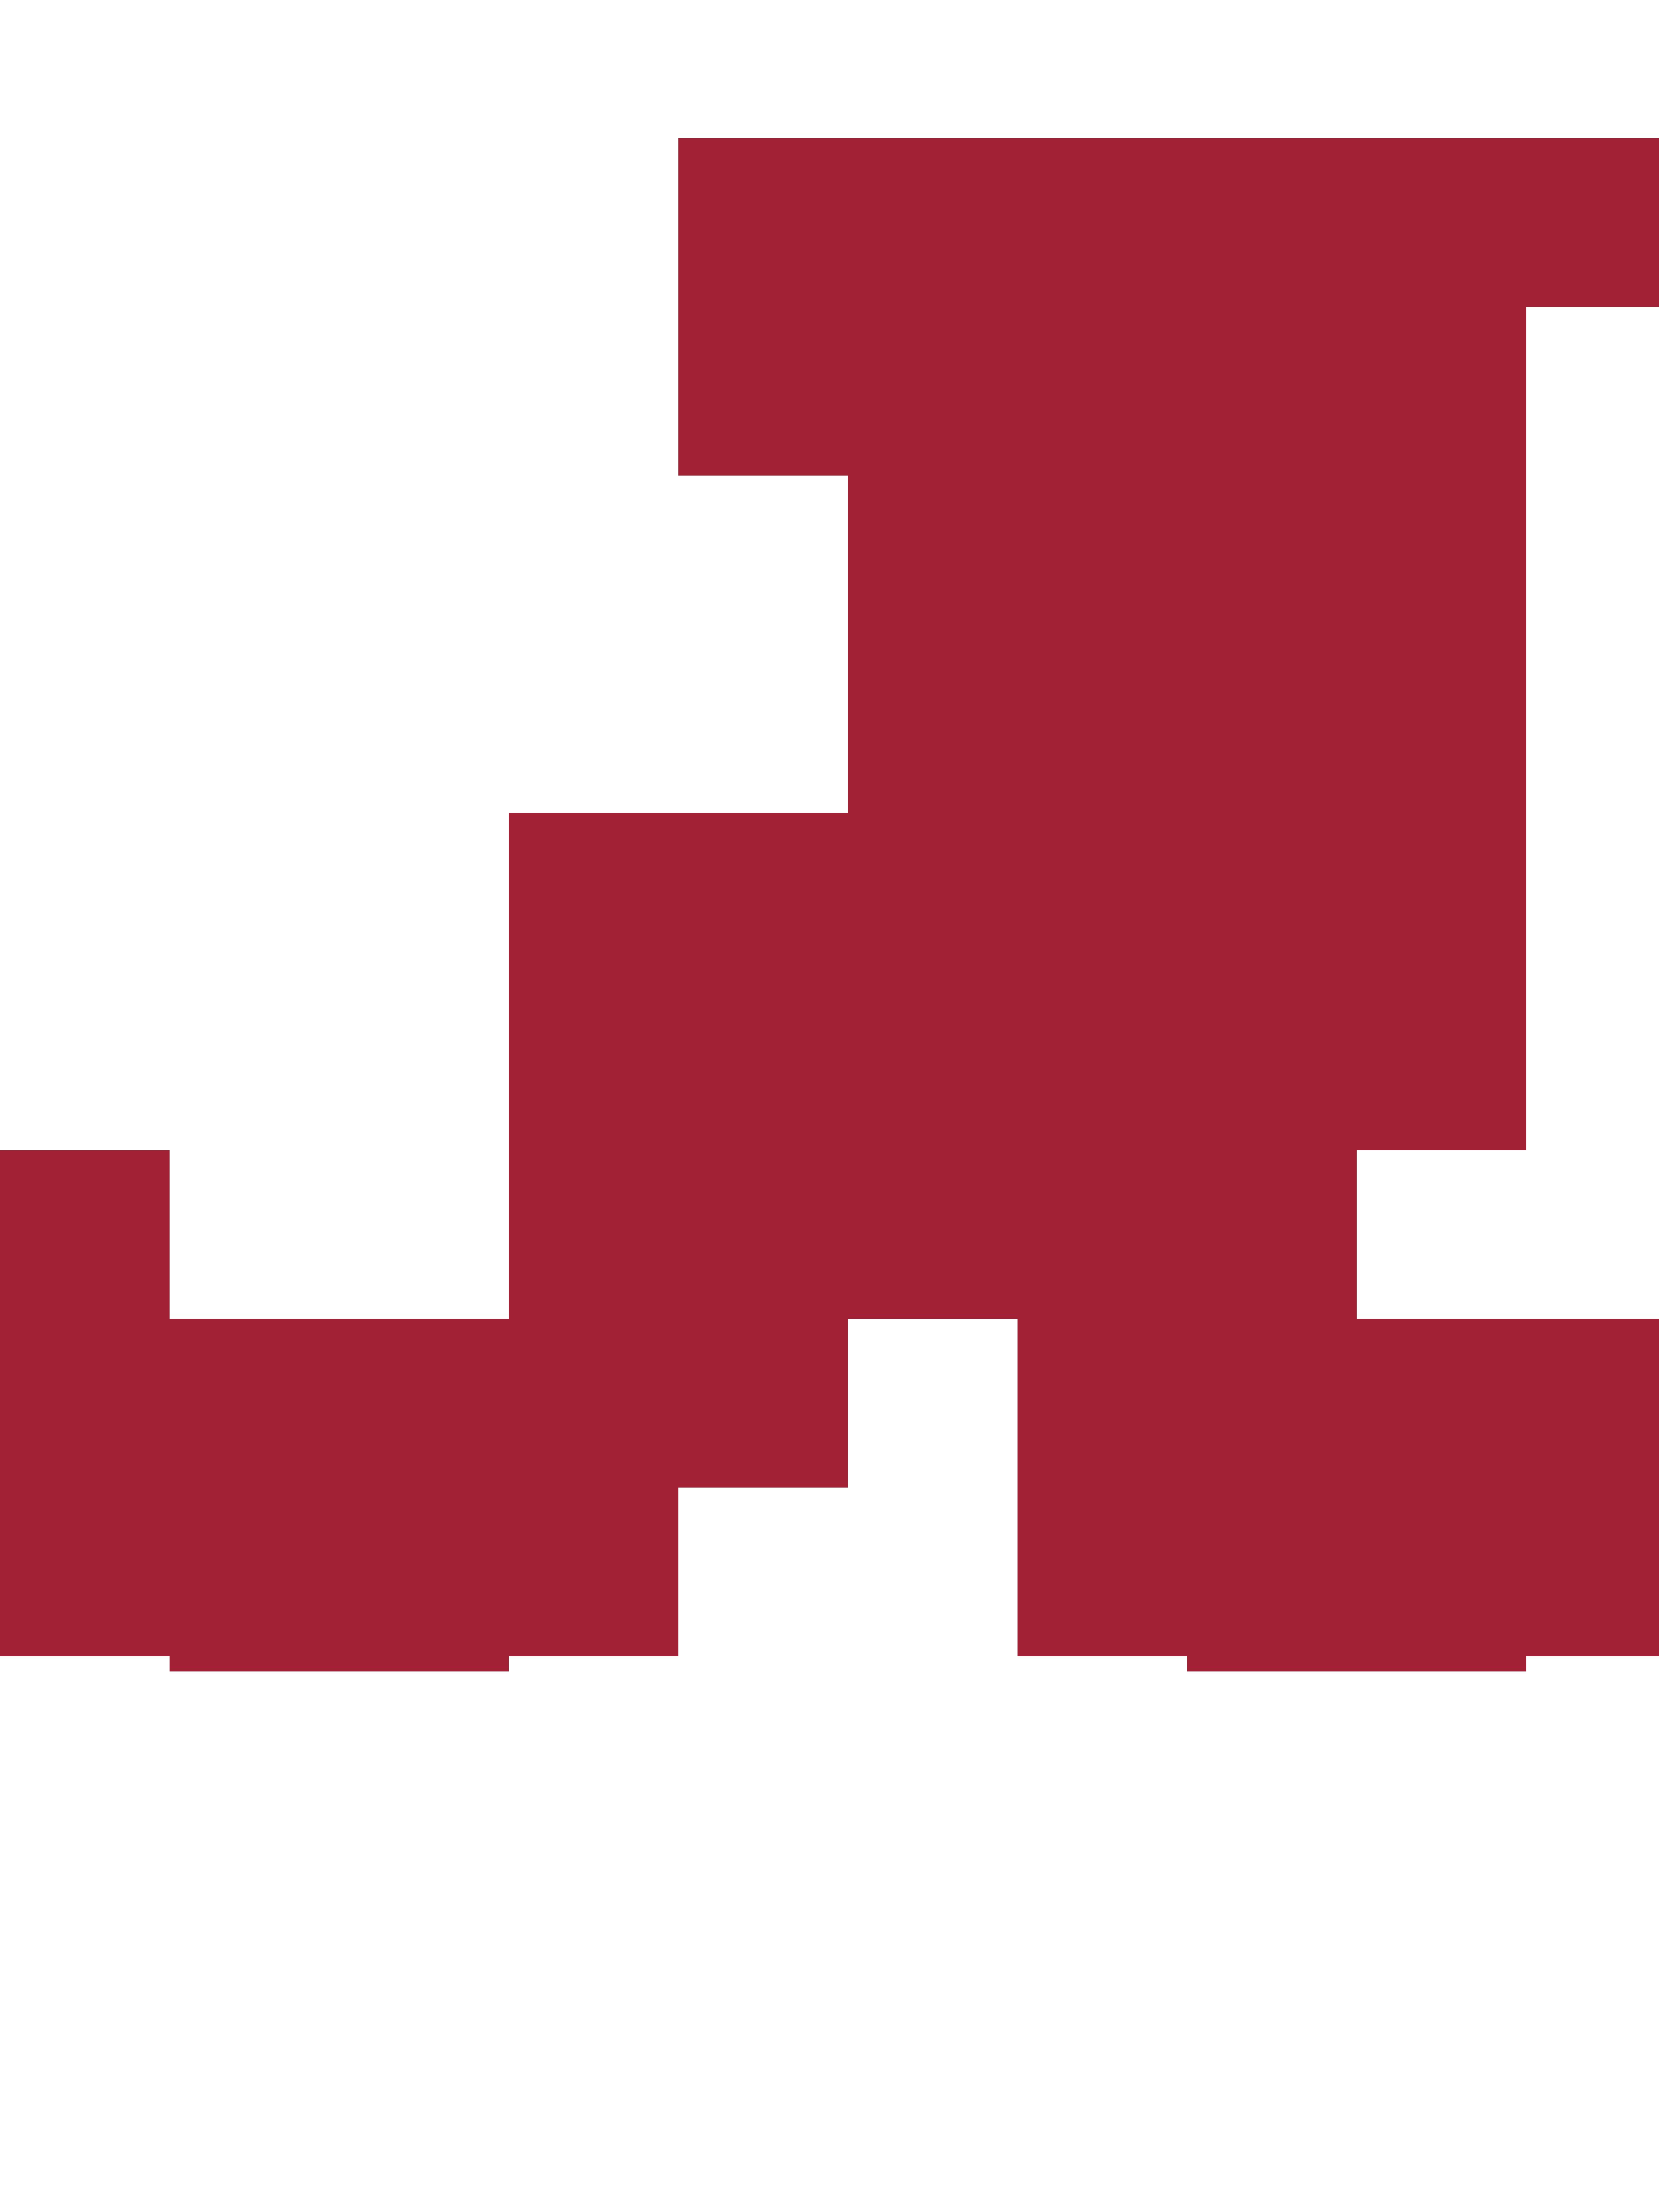 Venley Official NCAA Alabama Crimson Tide Womens and Youth Spirit Wear Jersey T-Shirt